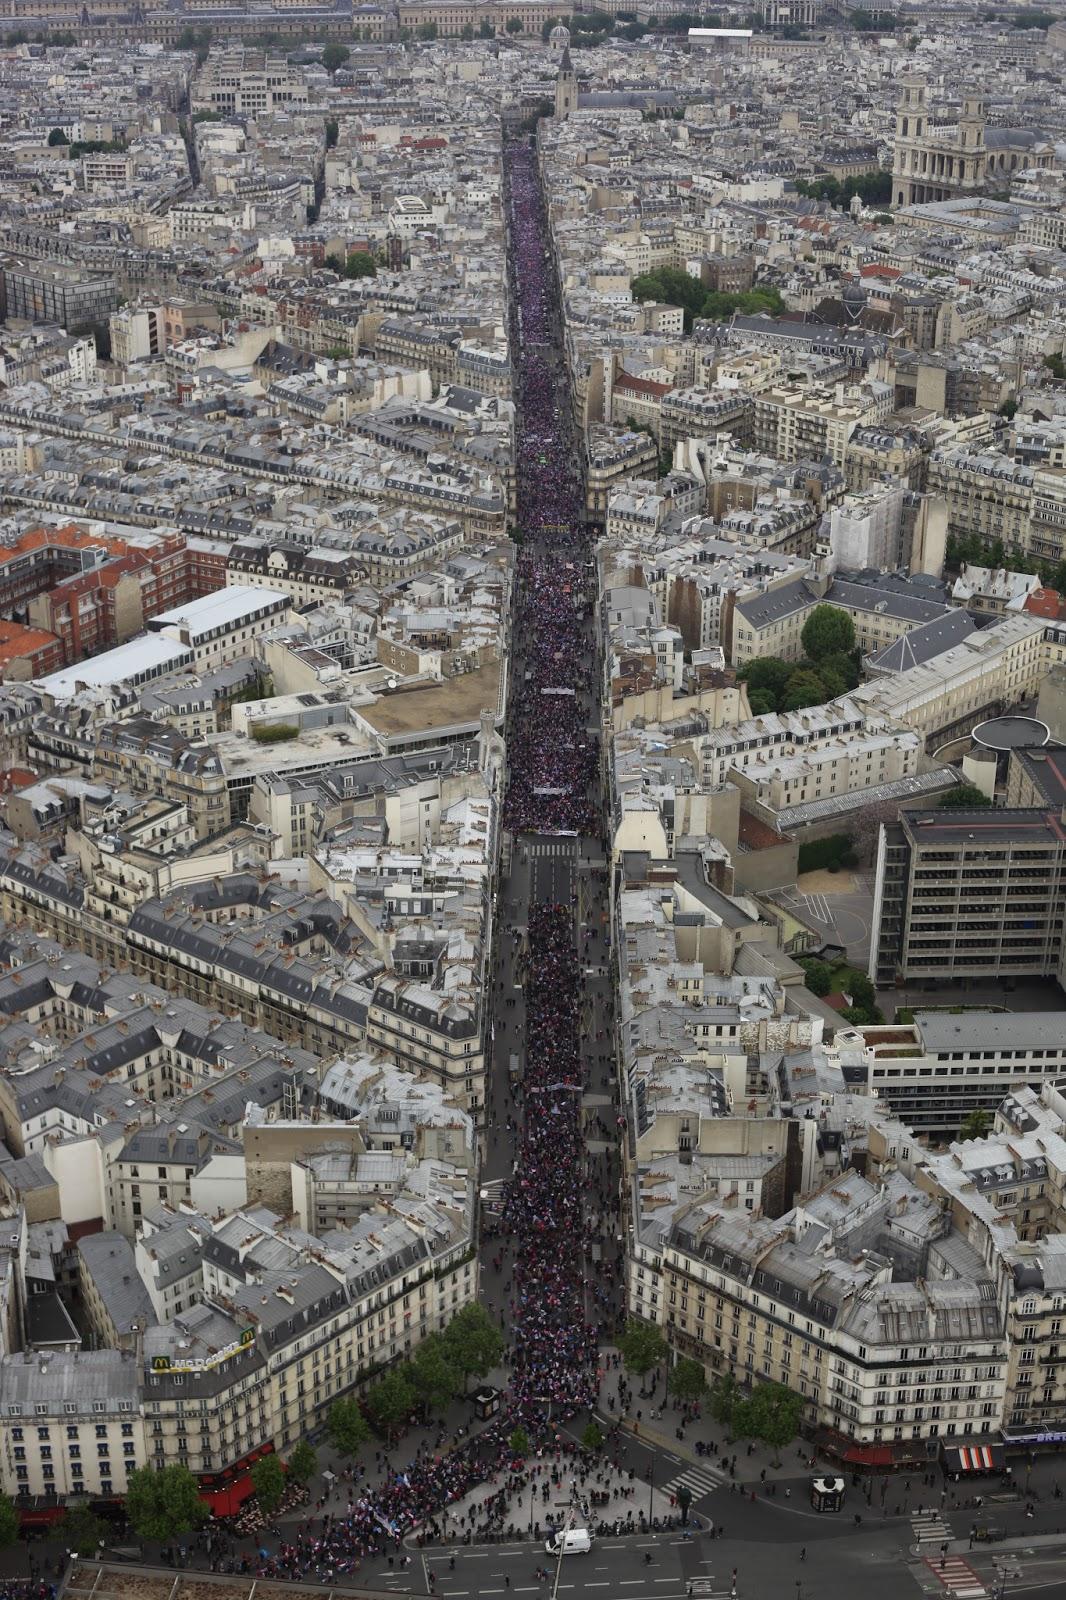 galliawatch the police say 160 000 le salon beige says one million